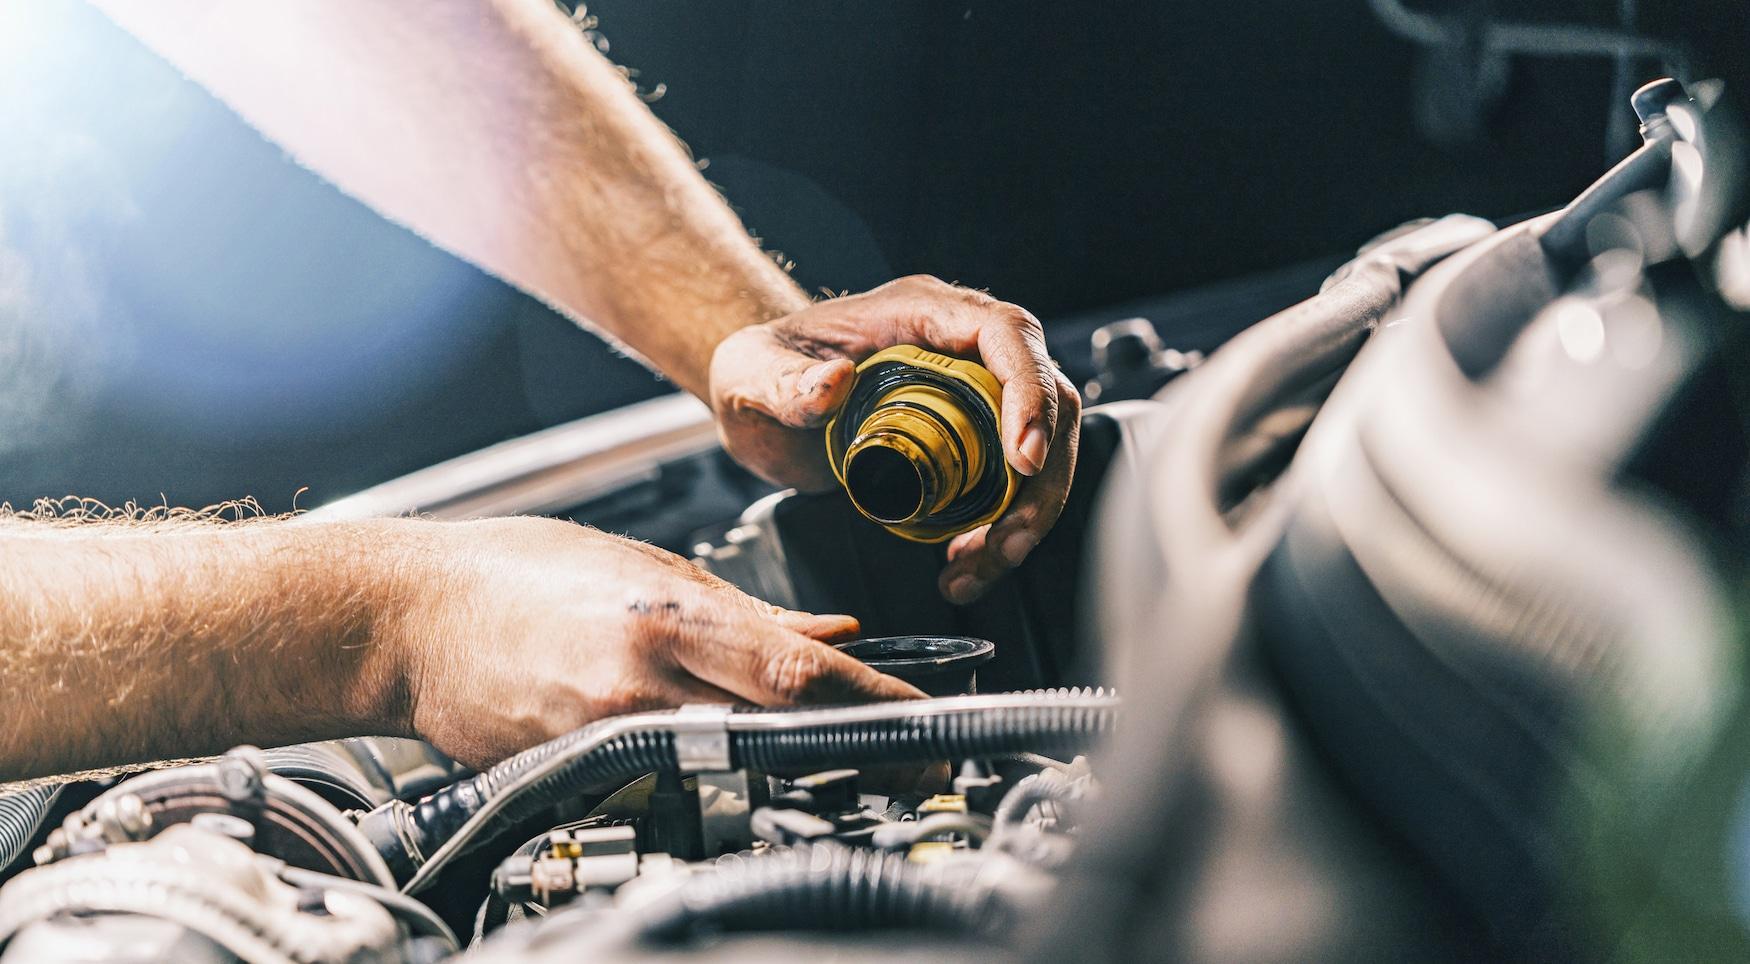 engine-maintenance-oil